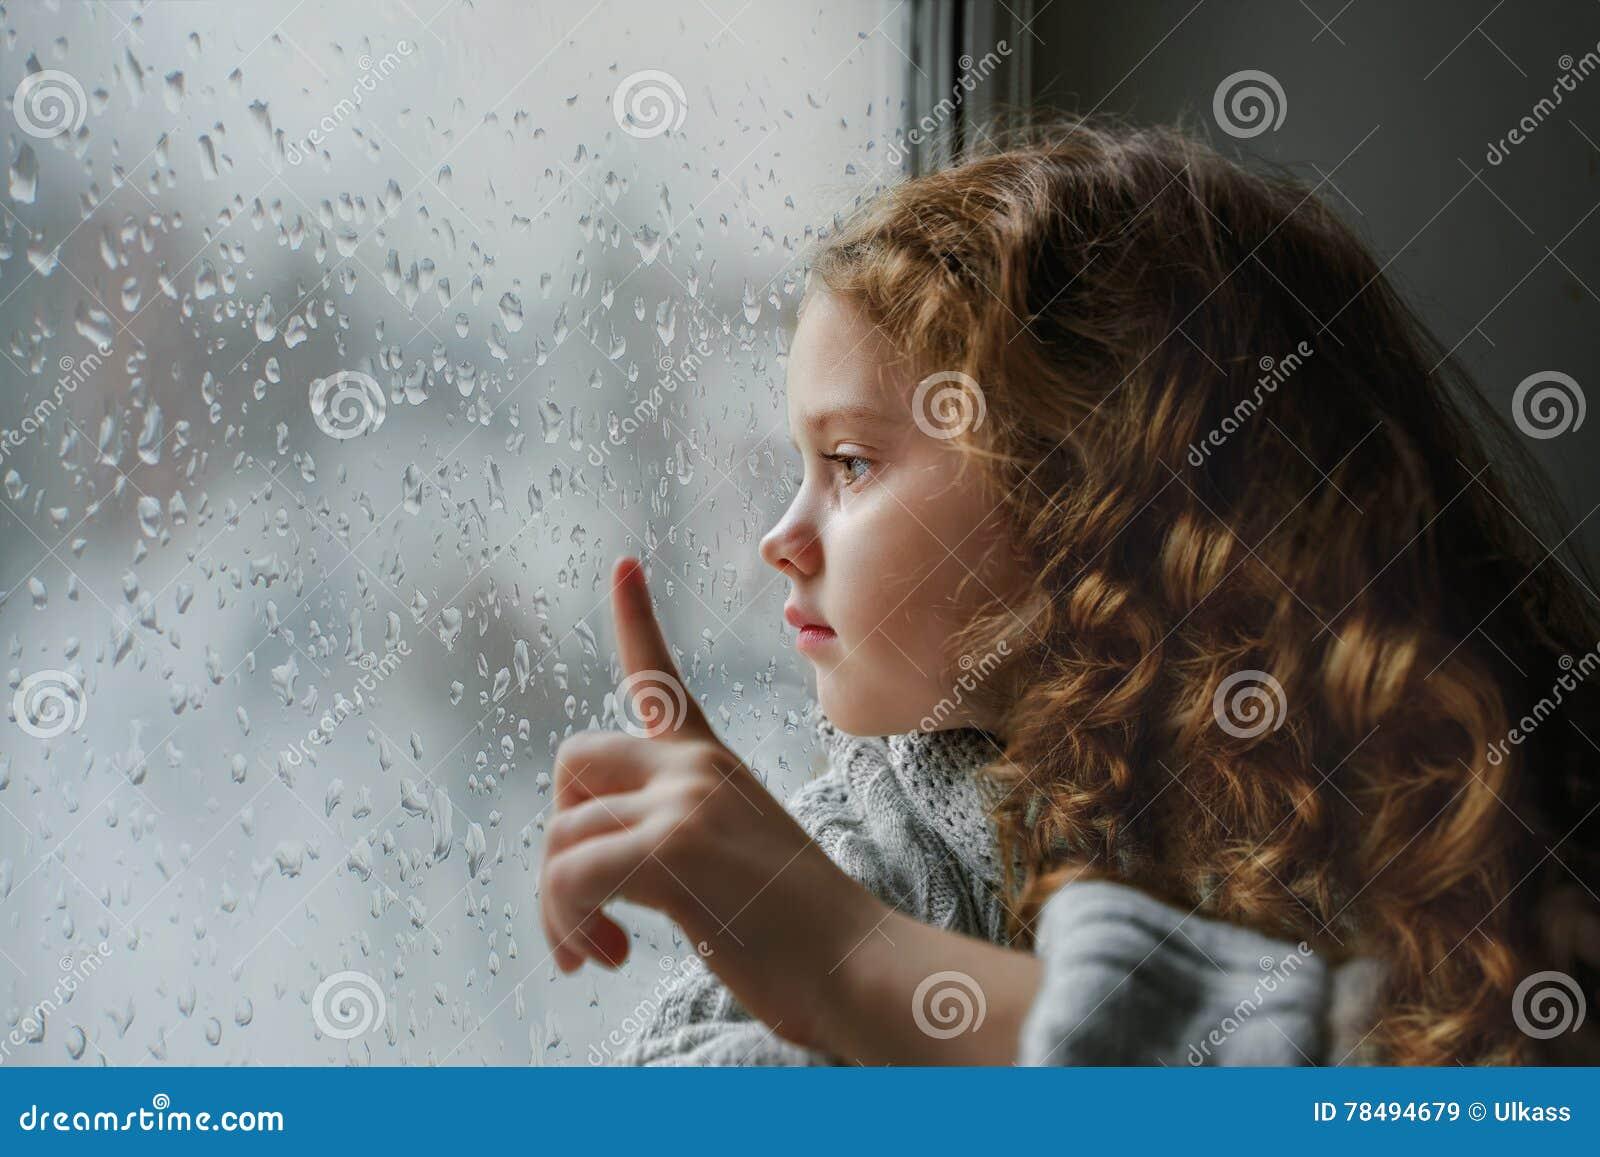 Sad Little Girl Looking Out The Window On Rain Drops Near